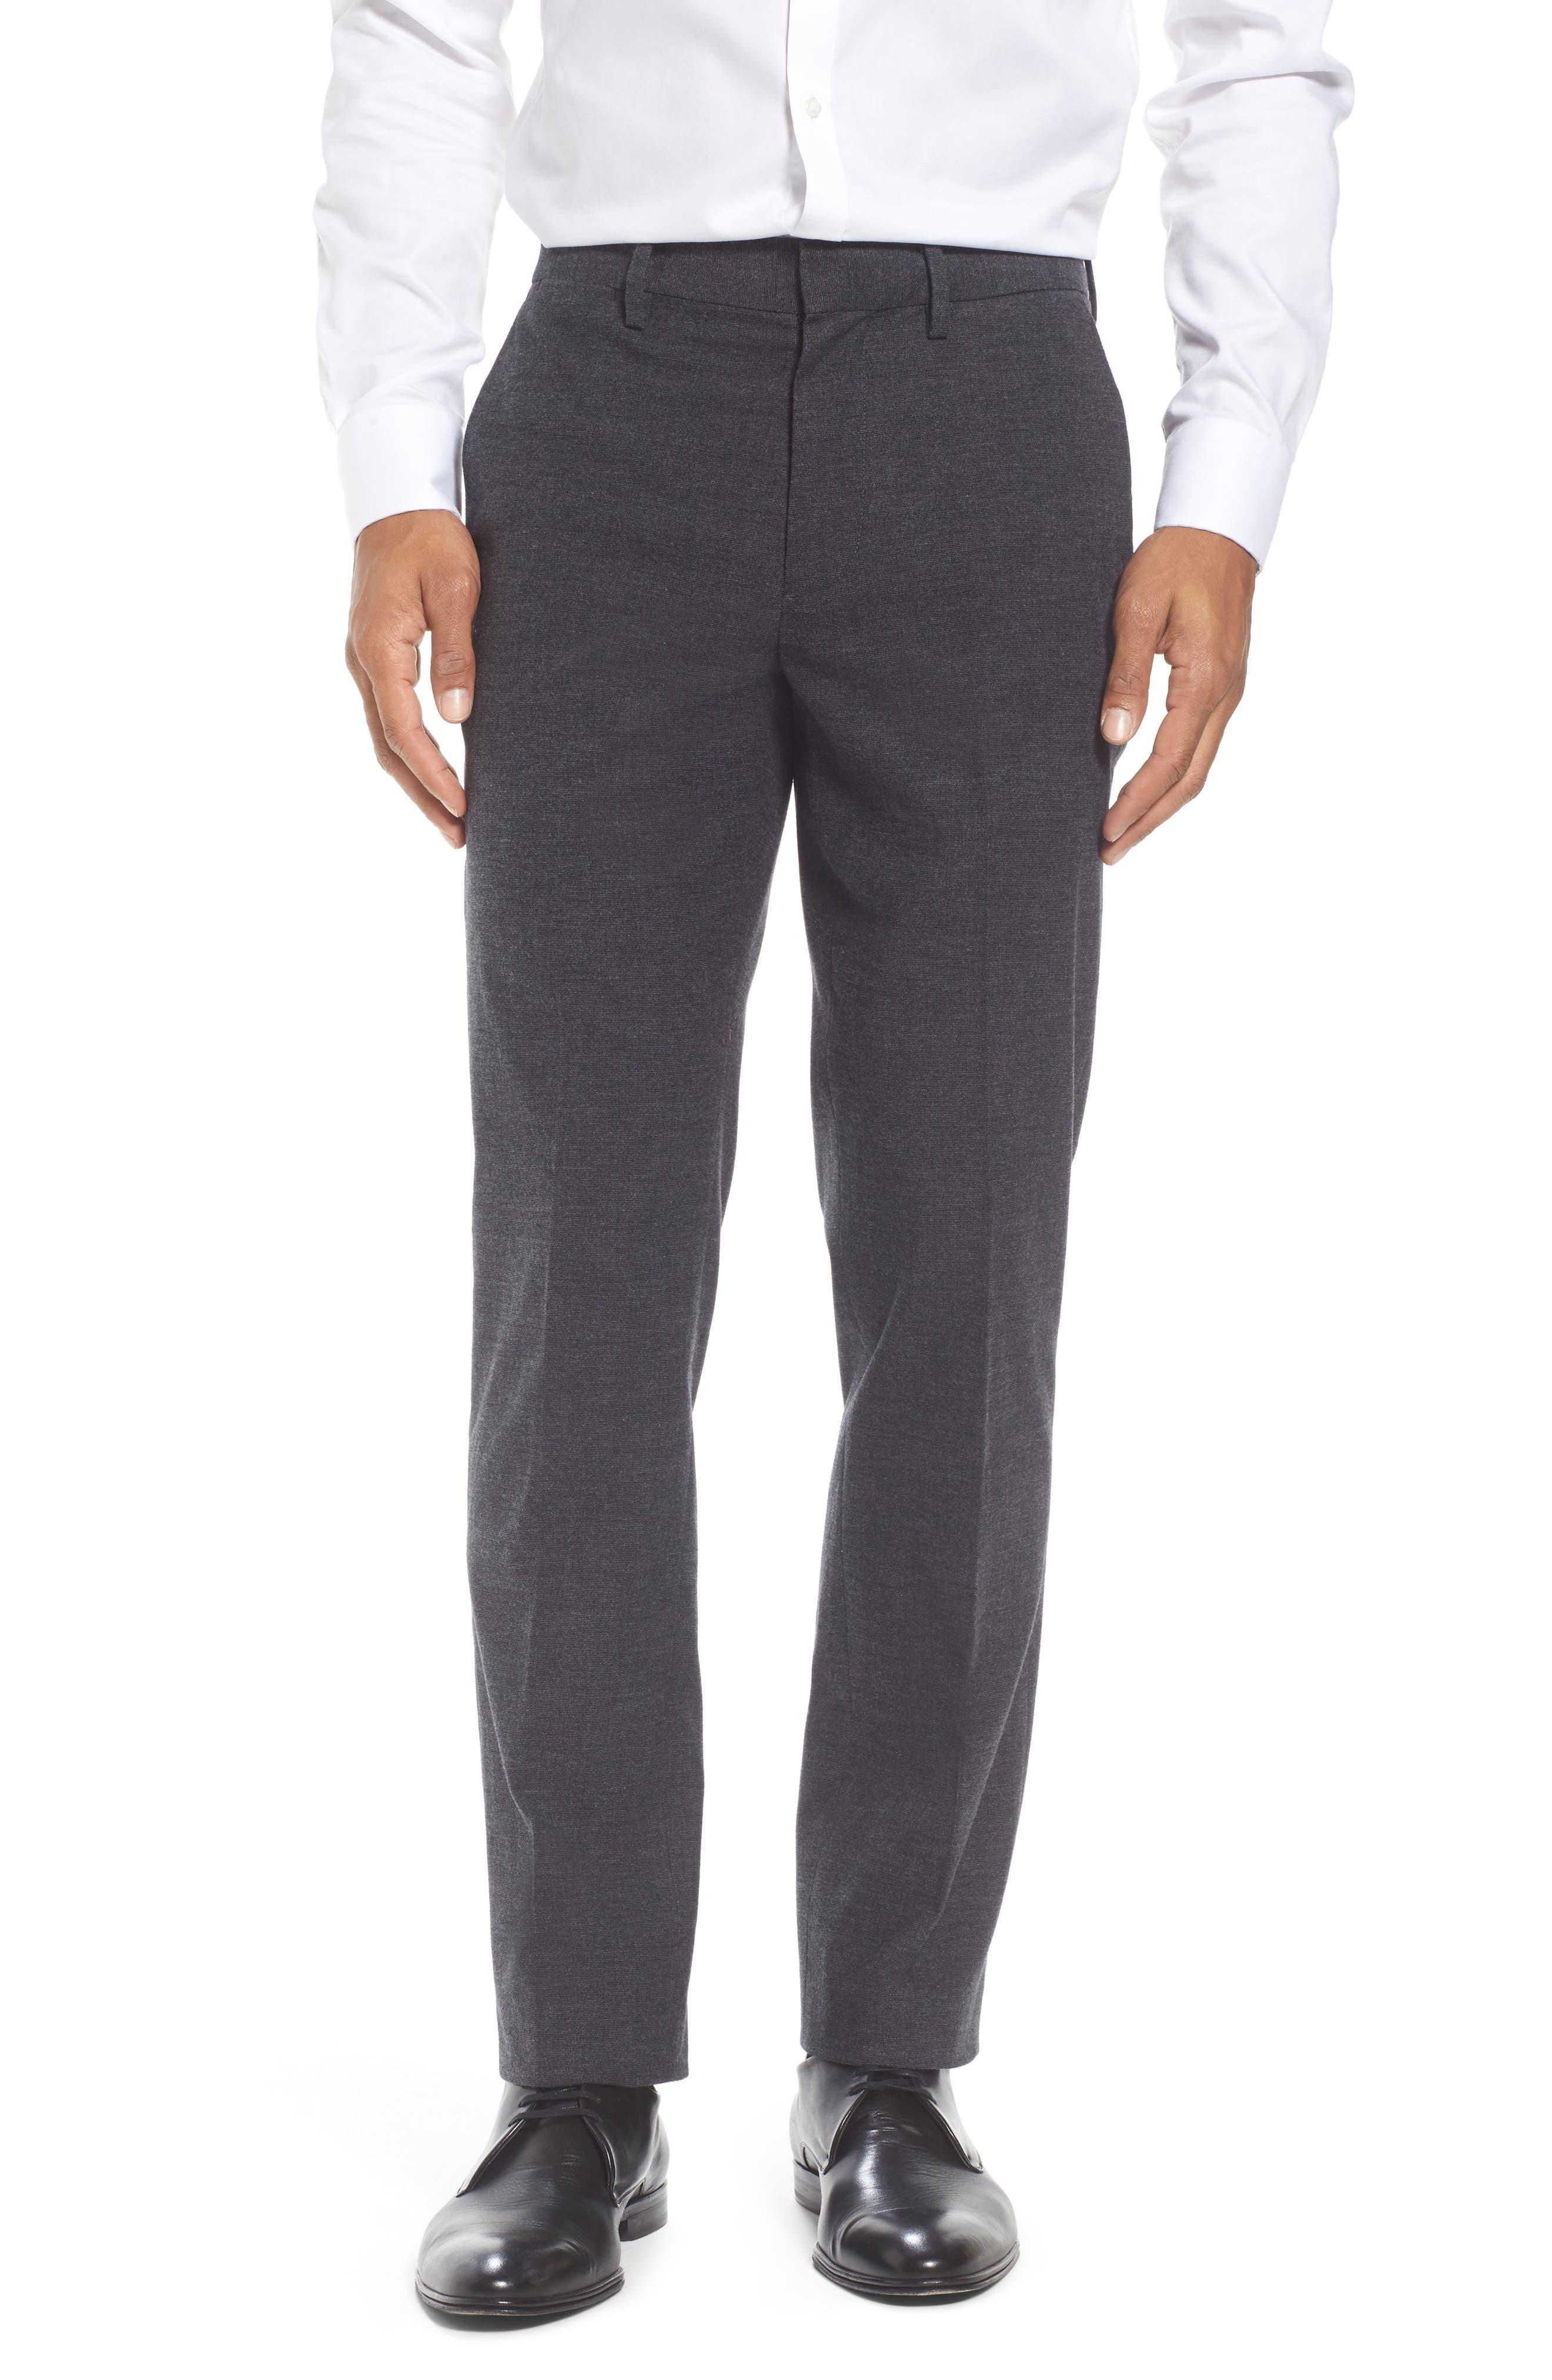 Alternate Image 1 Selected - Bonobos Foundation Slim Fit Trousers